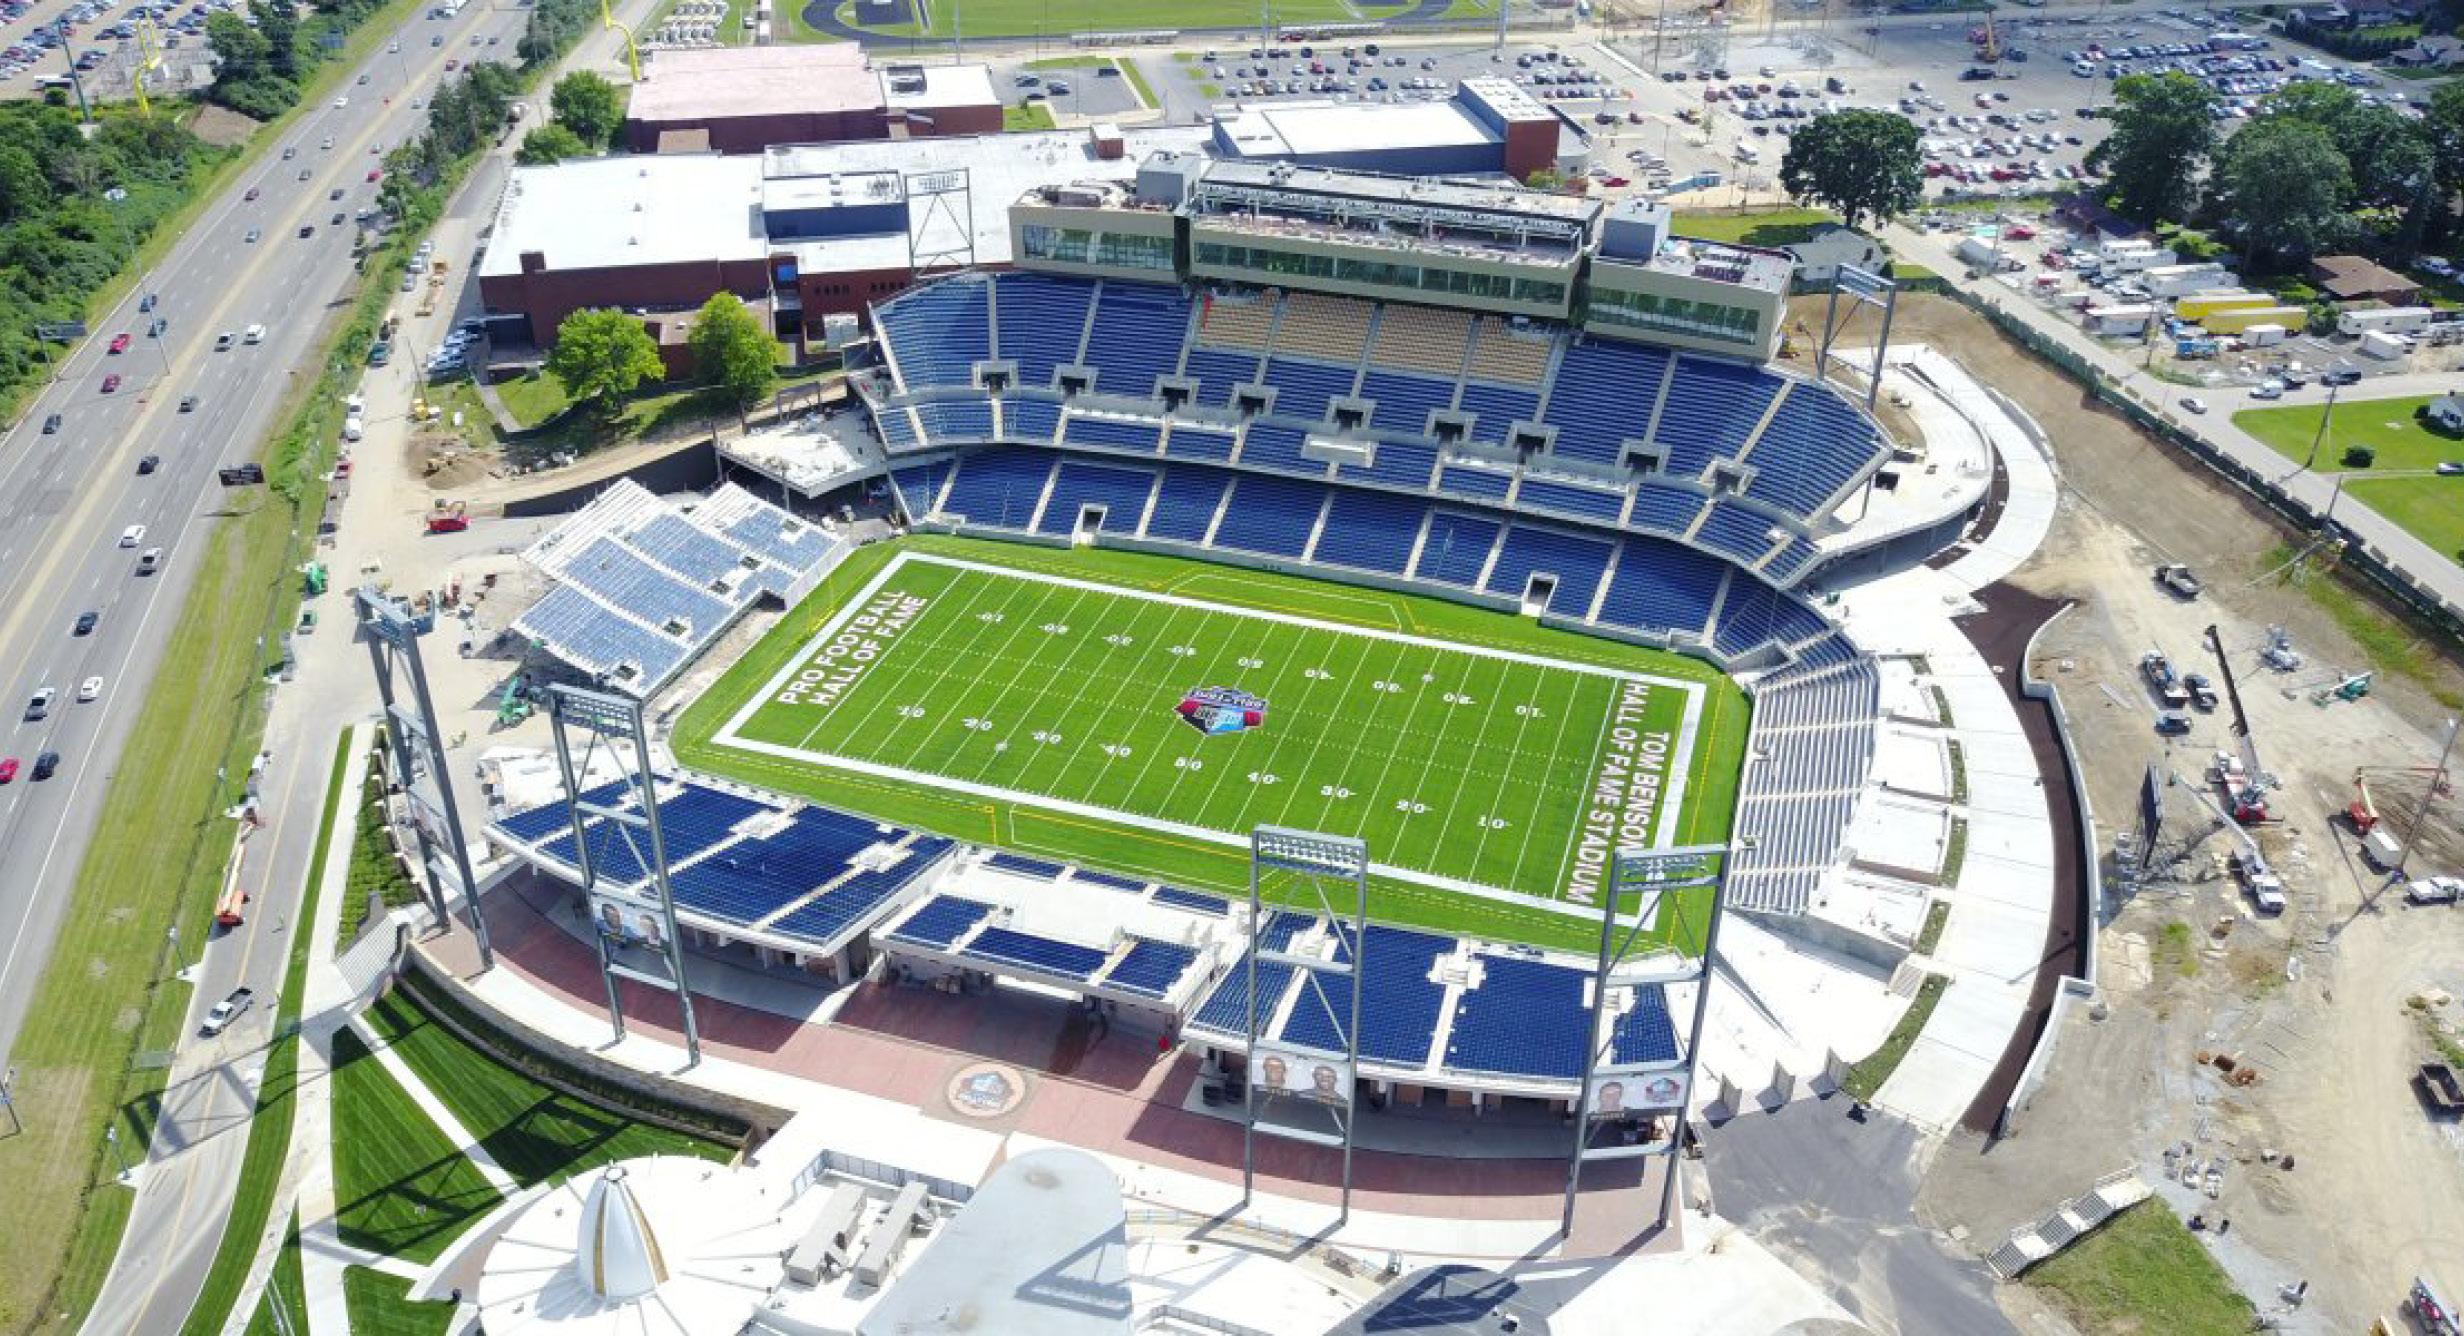 Tom Benson Hall of Fame Stadium & Johnson Controls Hall of Fame Village